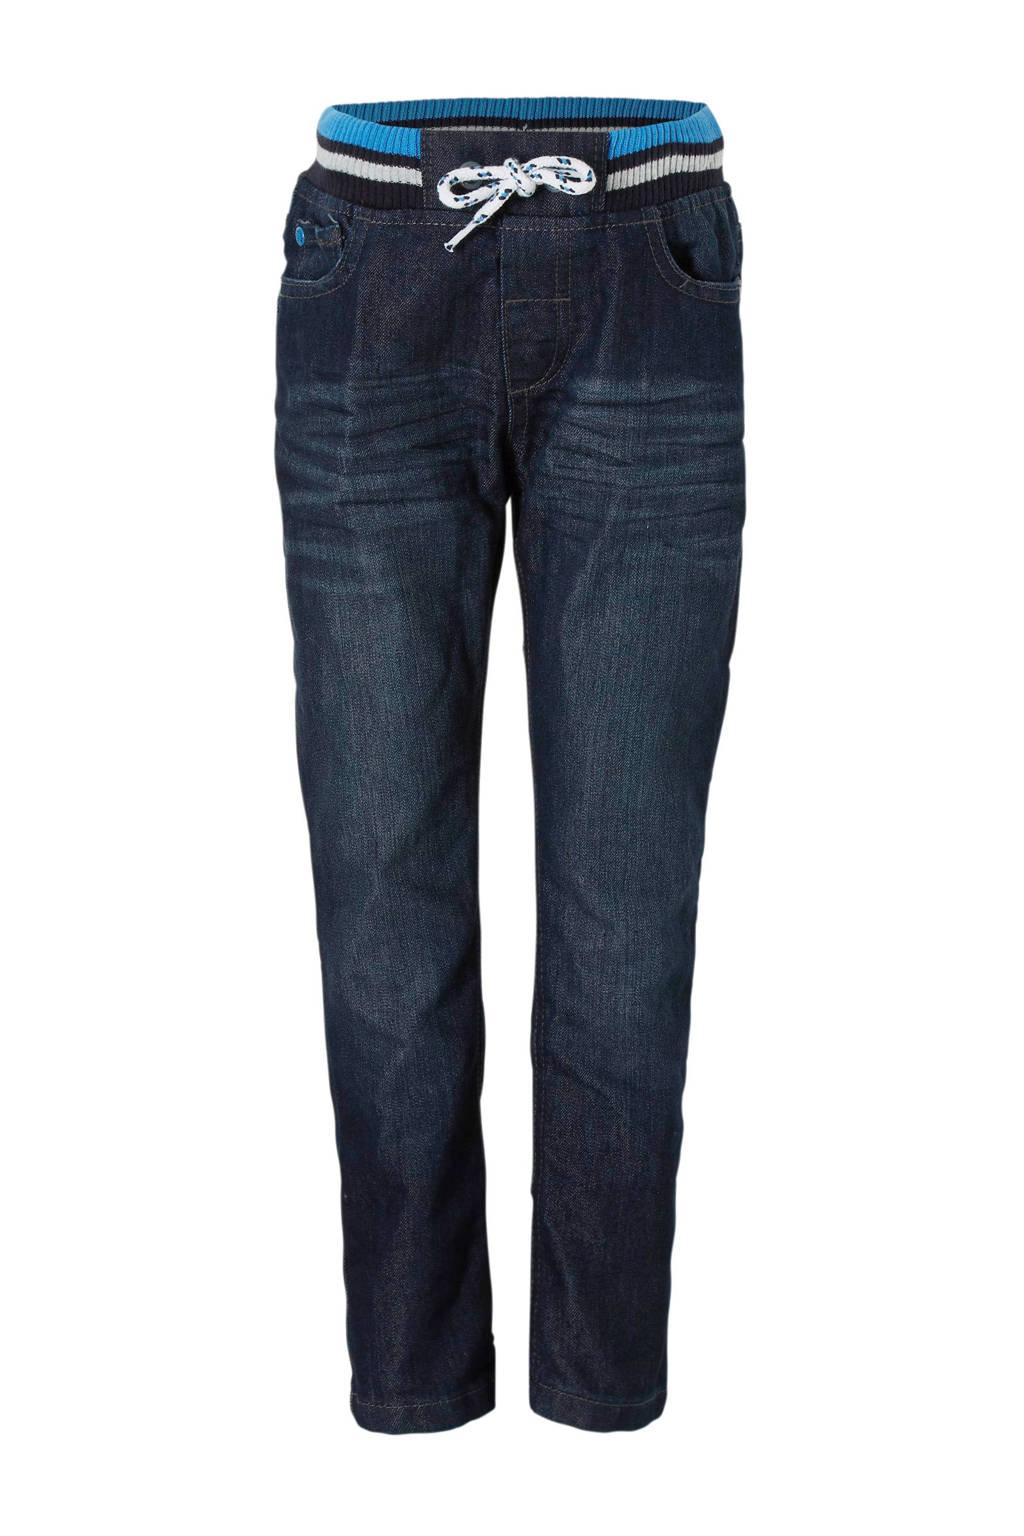 C&A Palomino slim fit jeans, Dark denim